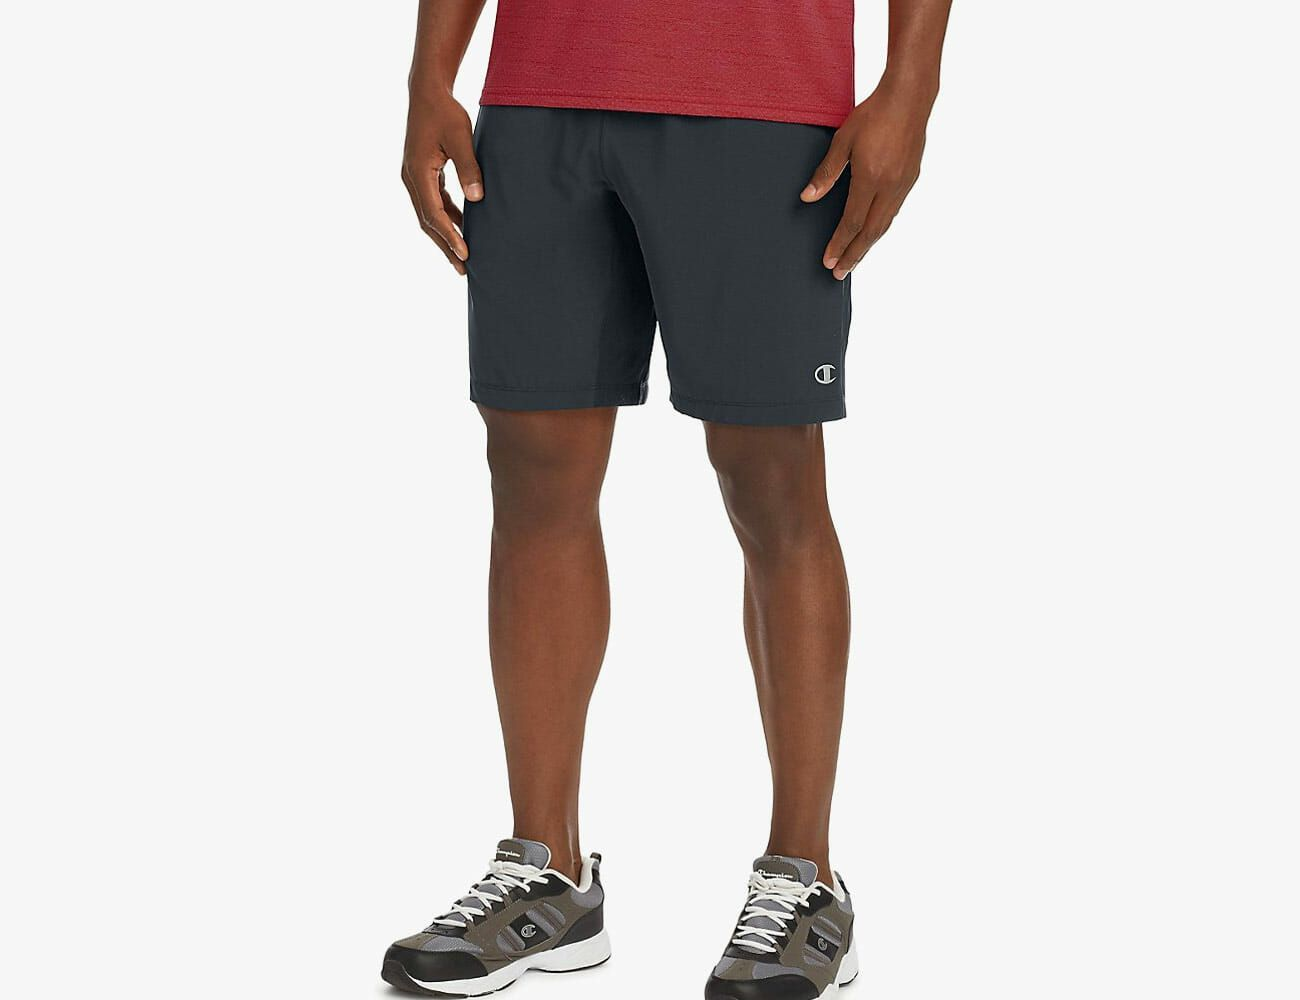 Running, Walking, Gym & Training, Fitness Polyester